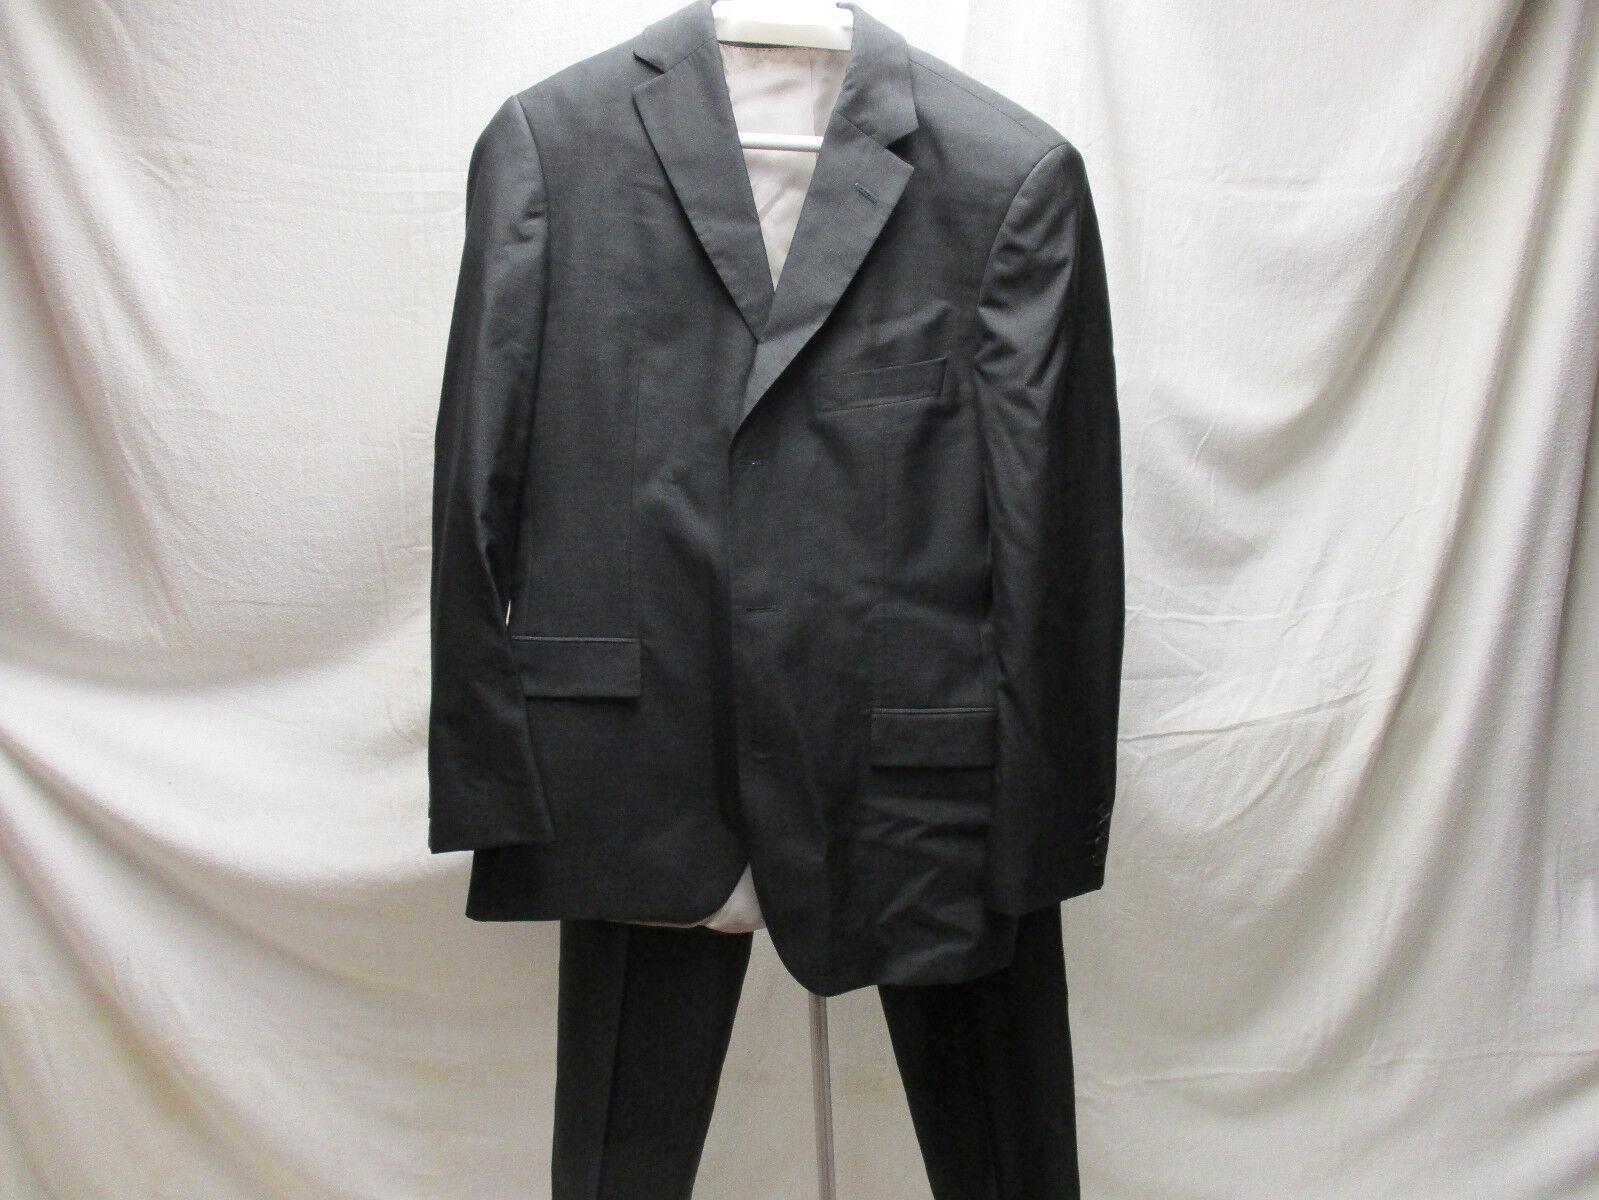 Hugo Boss Men's 2 Piece 3 Button Suit 40US Made in USA Originally over